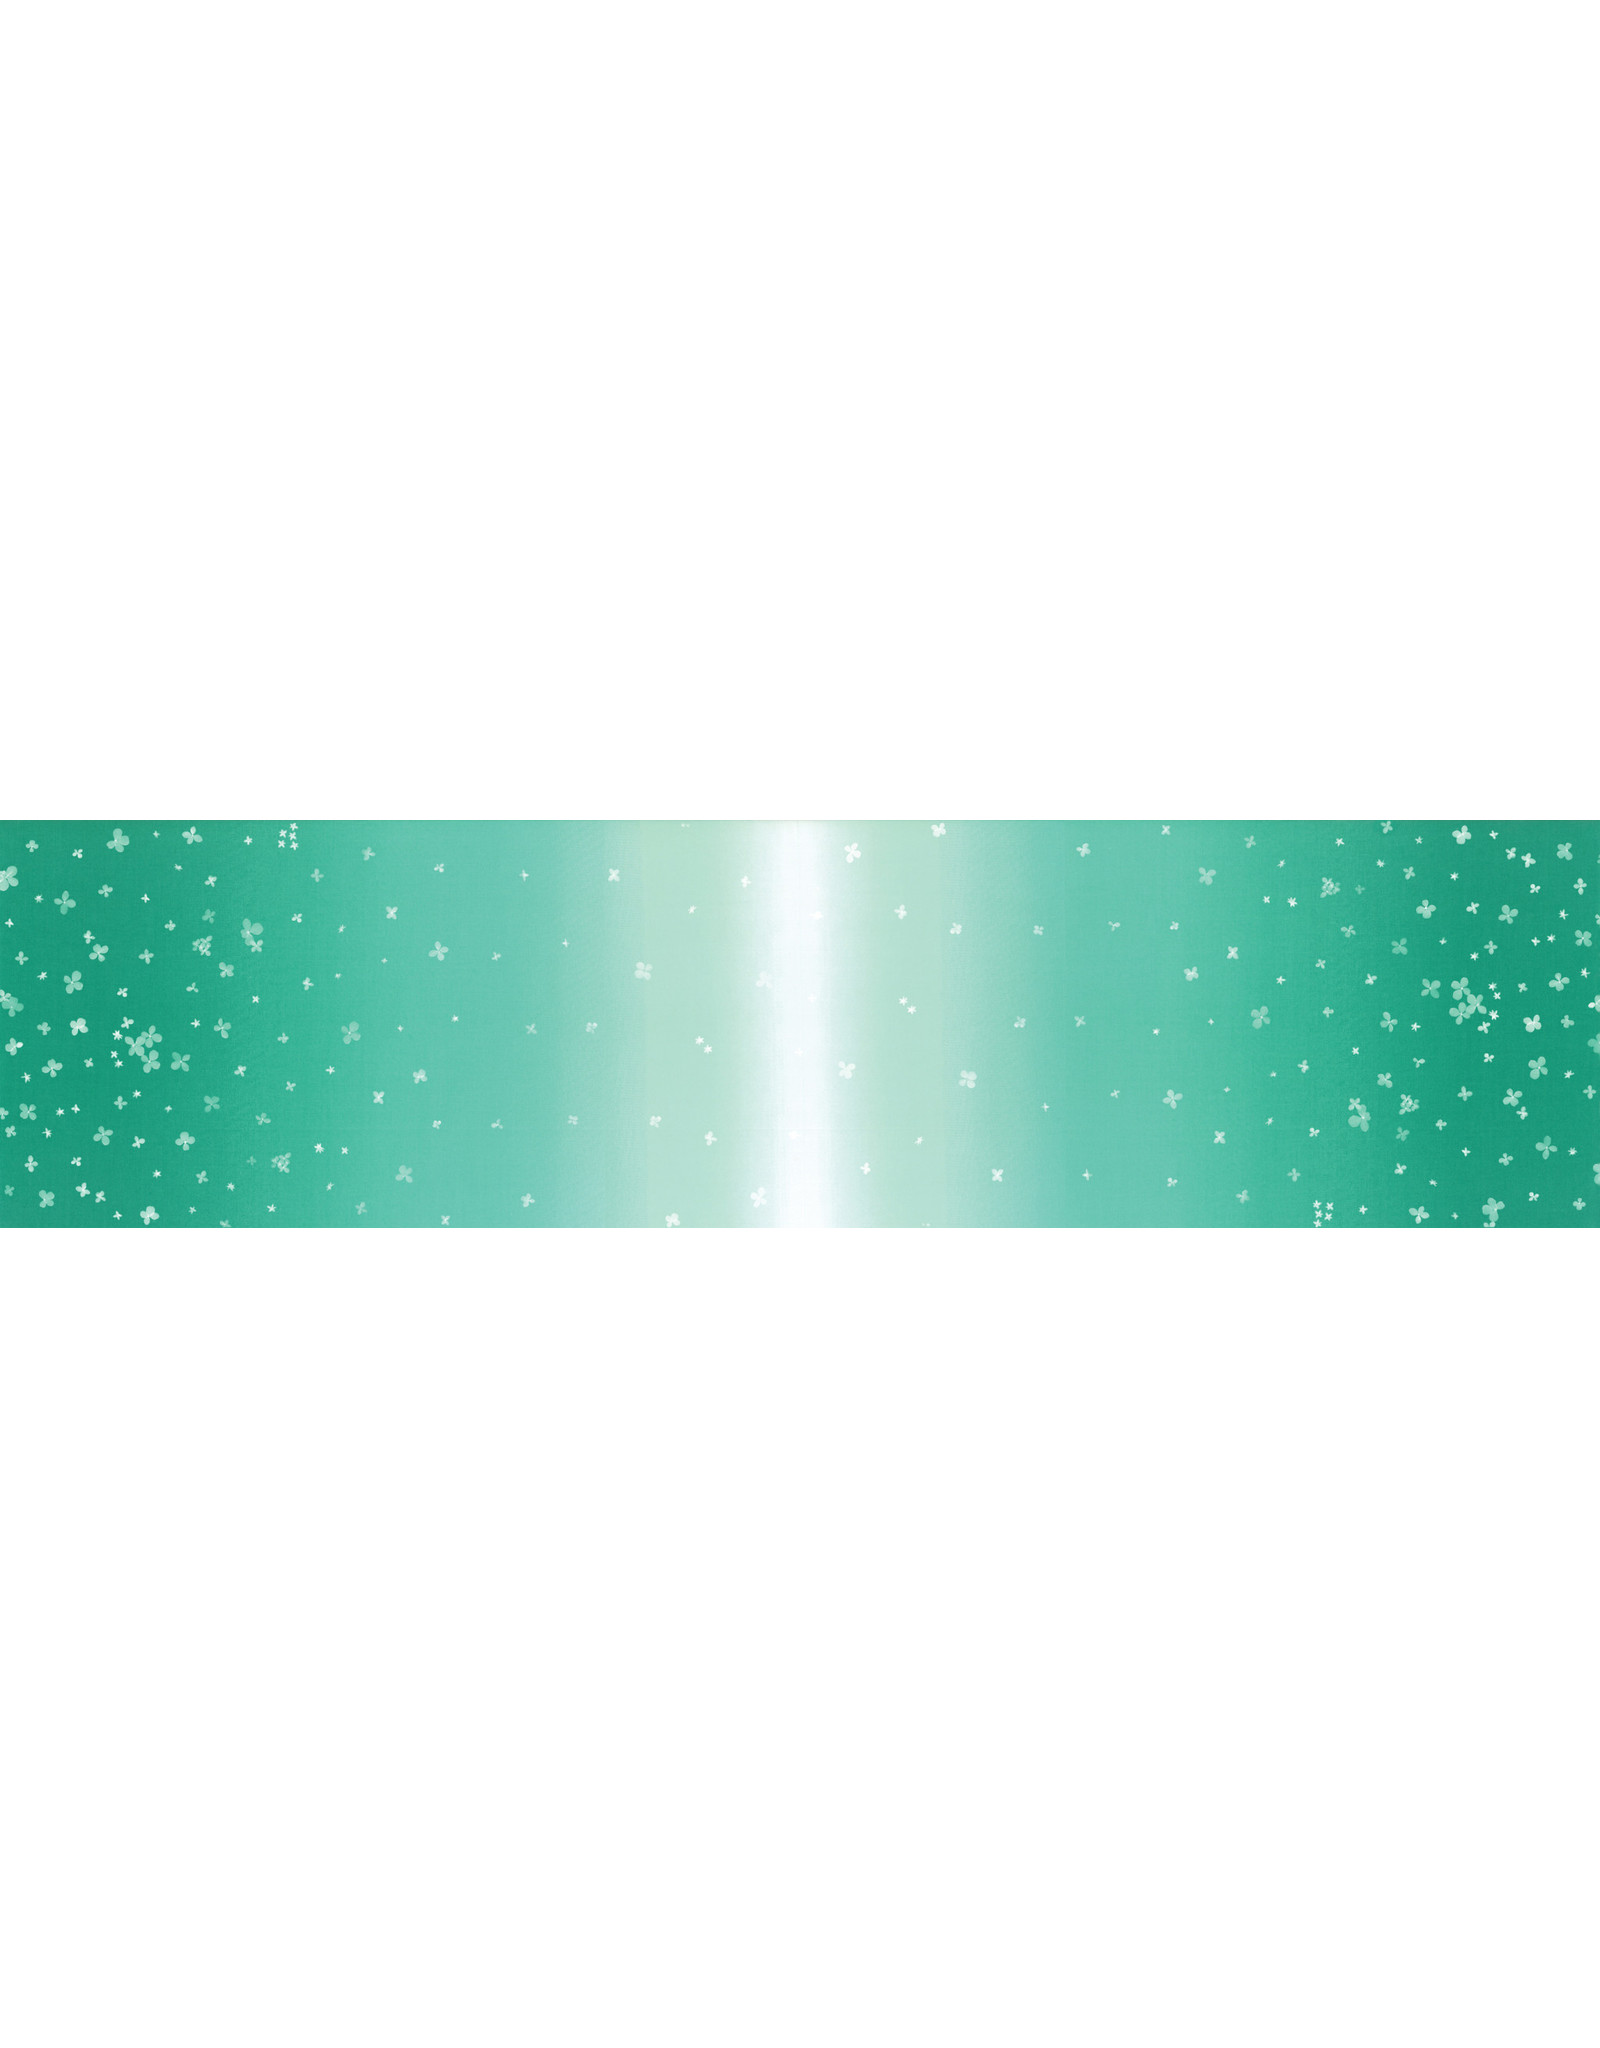 Moda Ombre Bloom - Teal